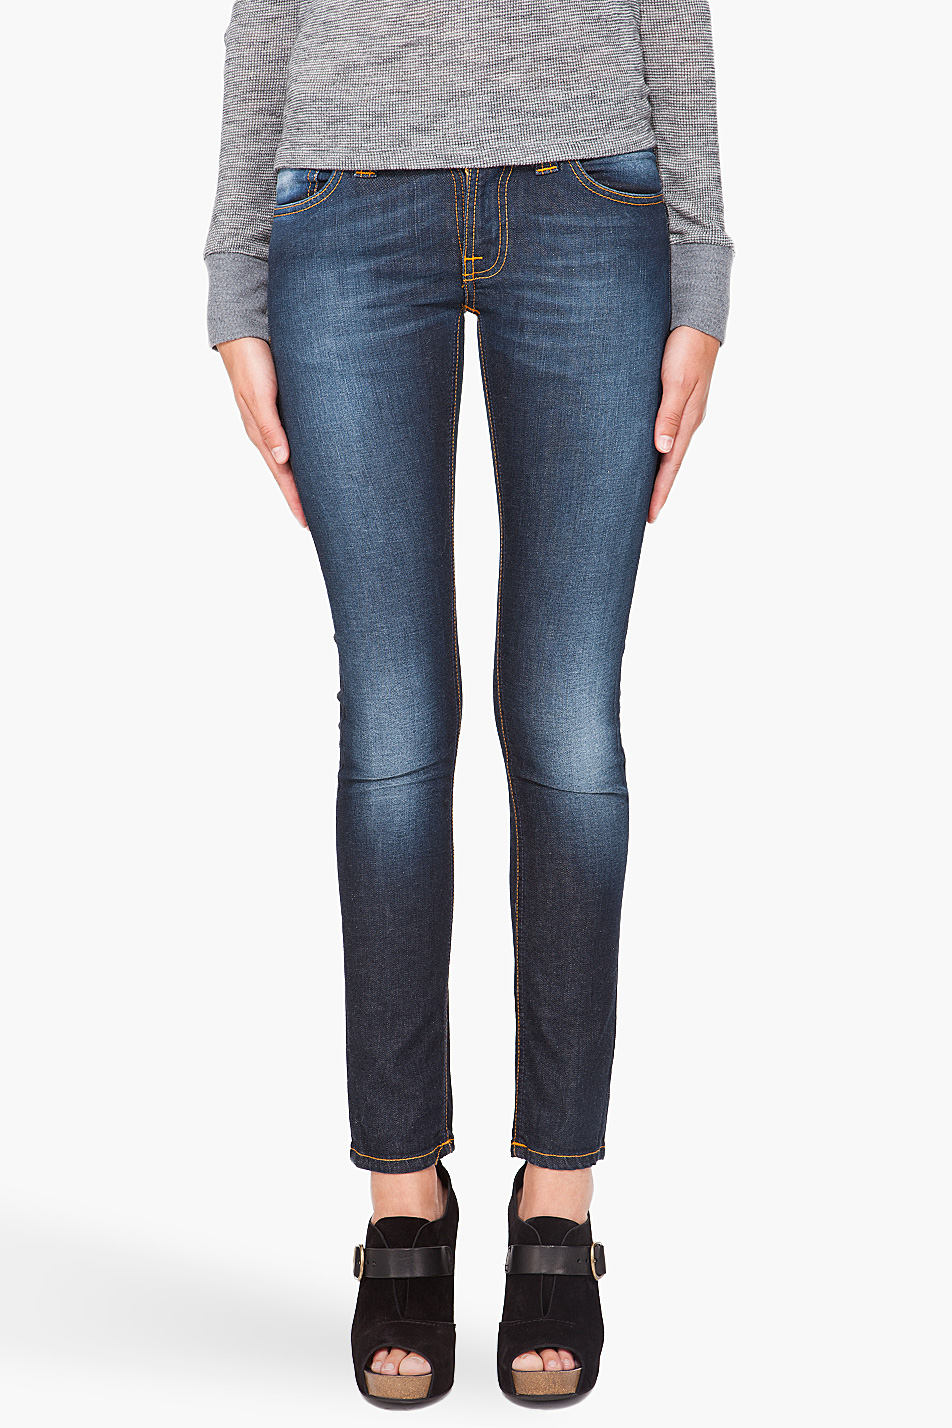 Lyst - Nudie Jeans Tight Long John Dark Jeans in Blue b4449c0f8